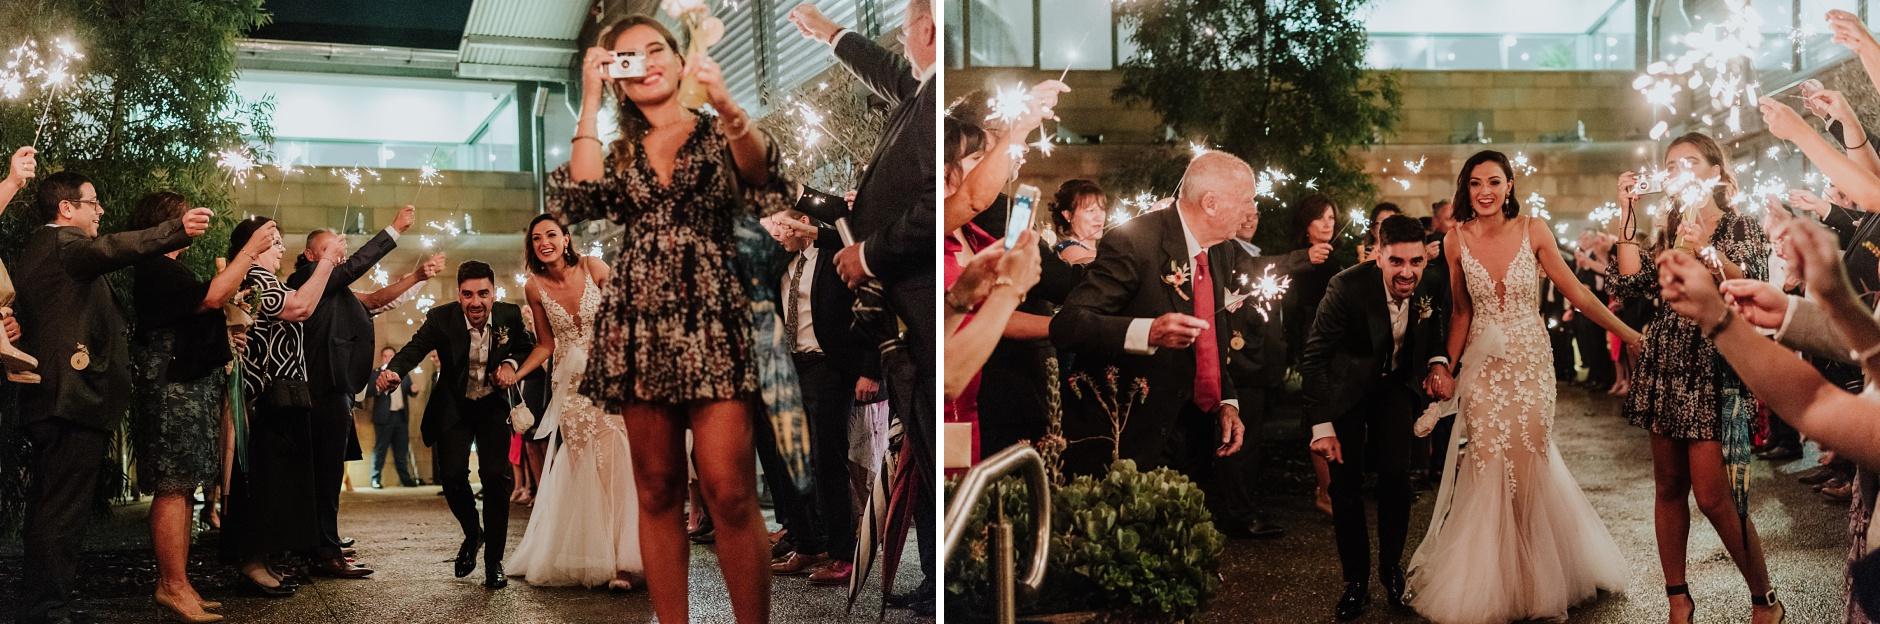 Sydney-Wedding-Photographer_0196.jpg